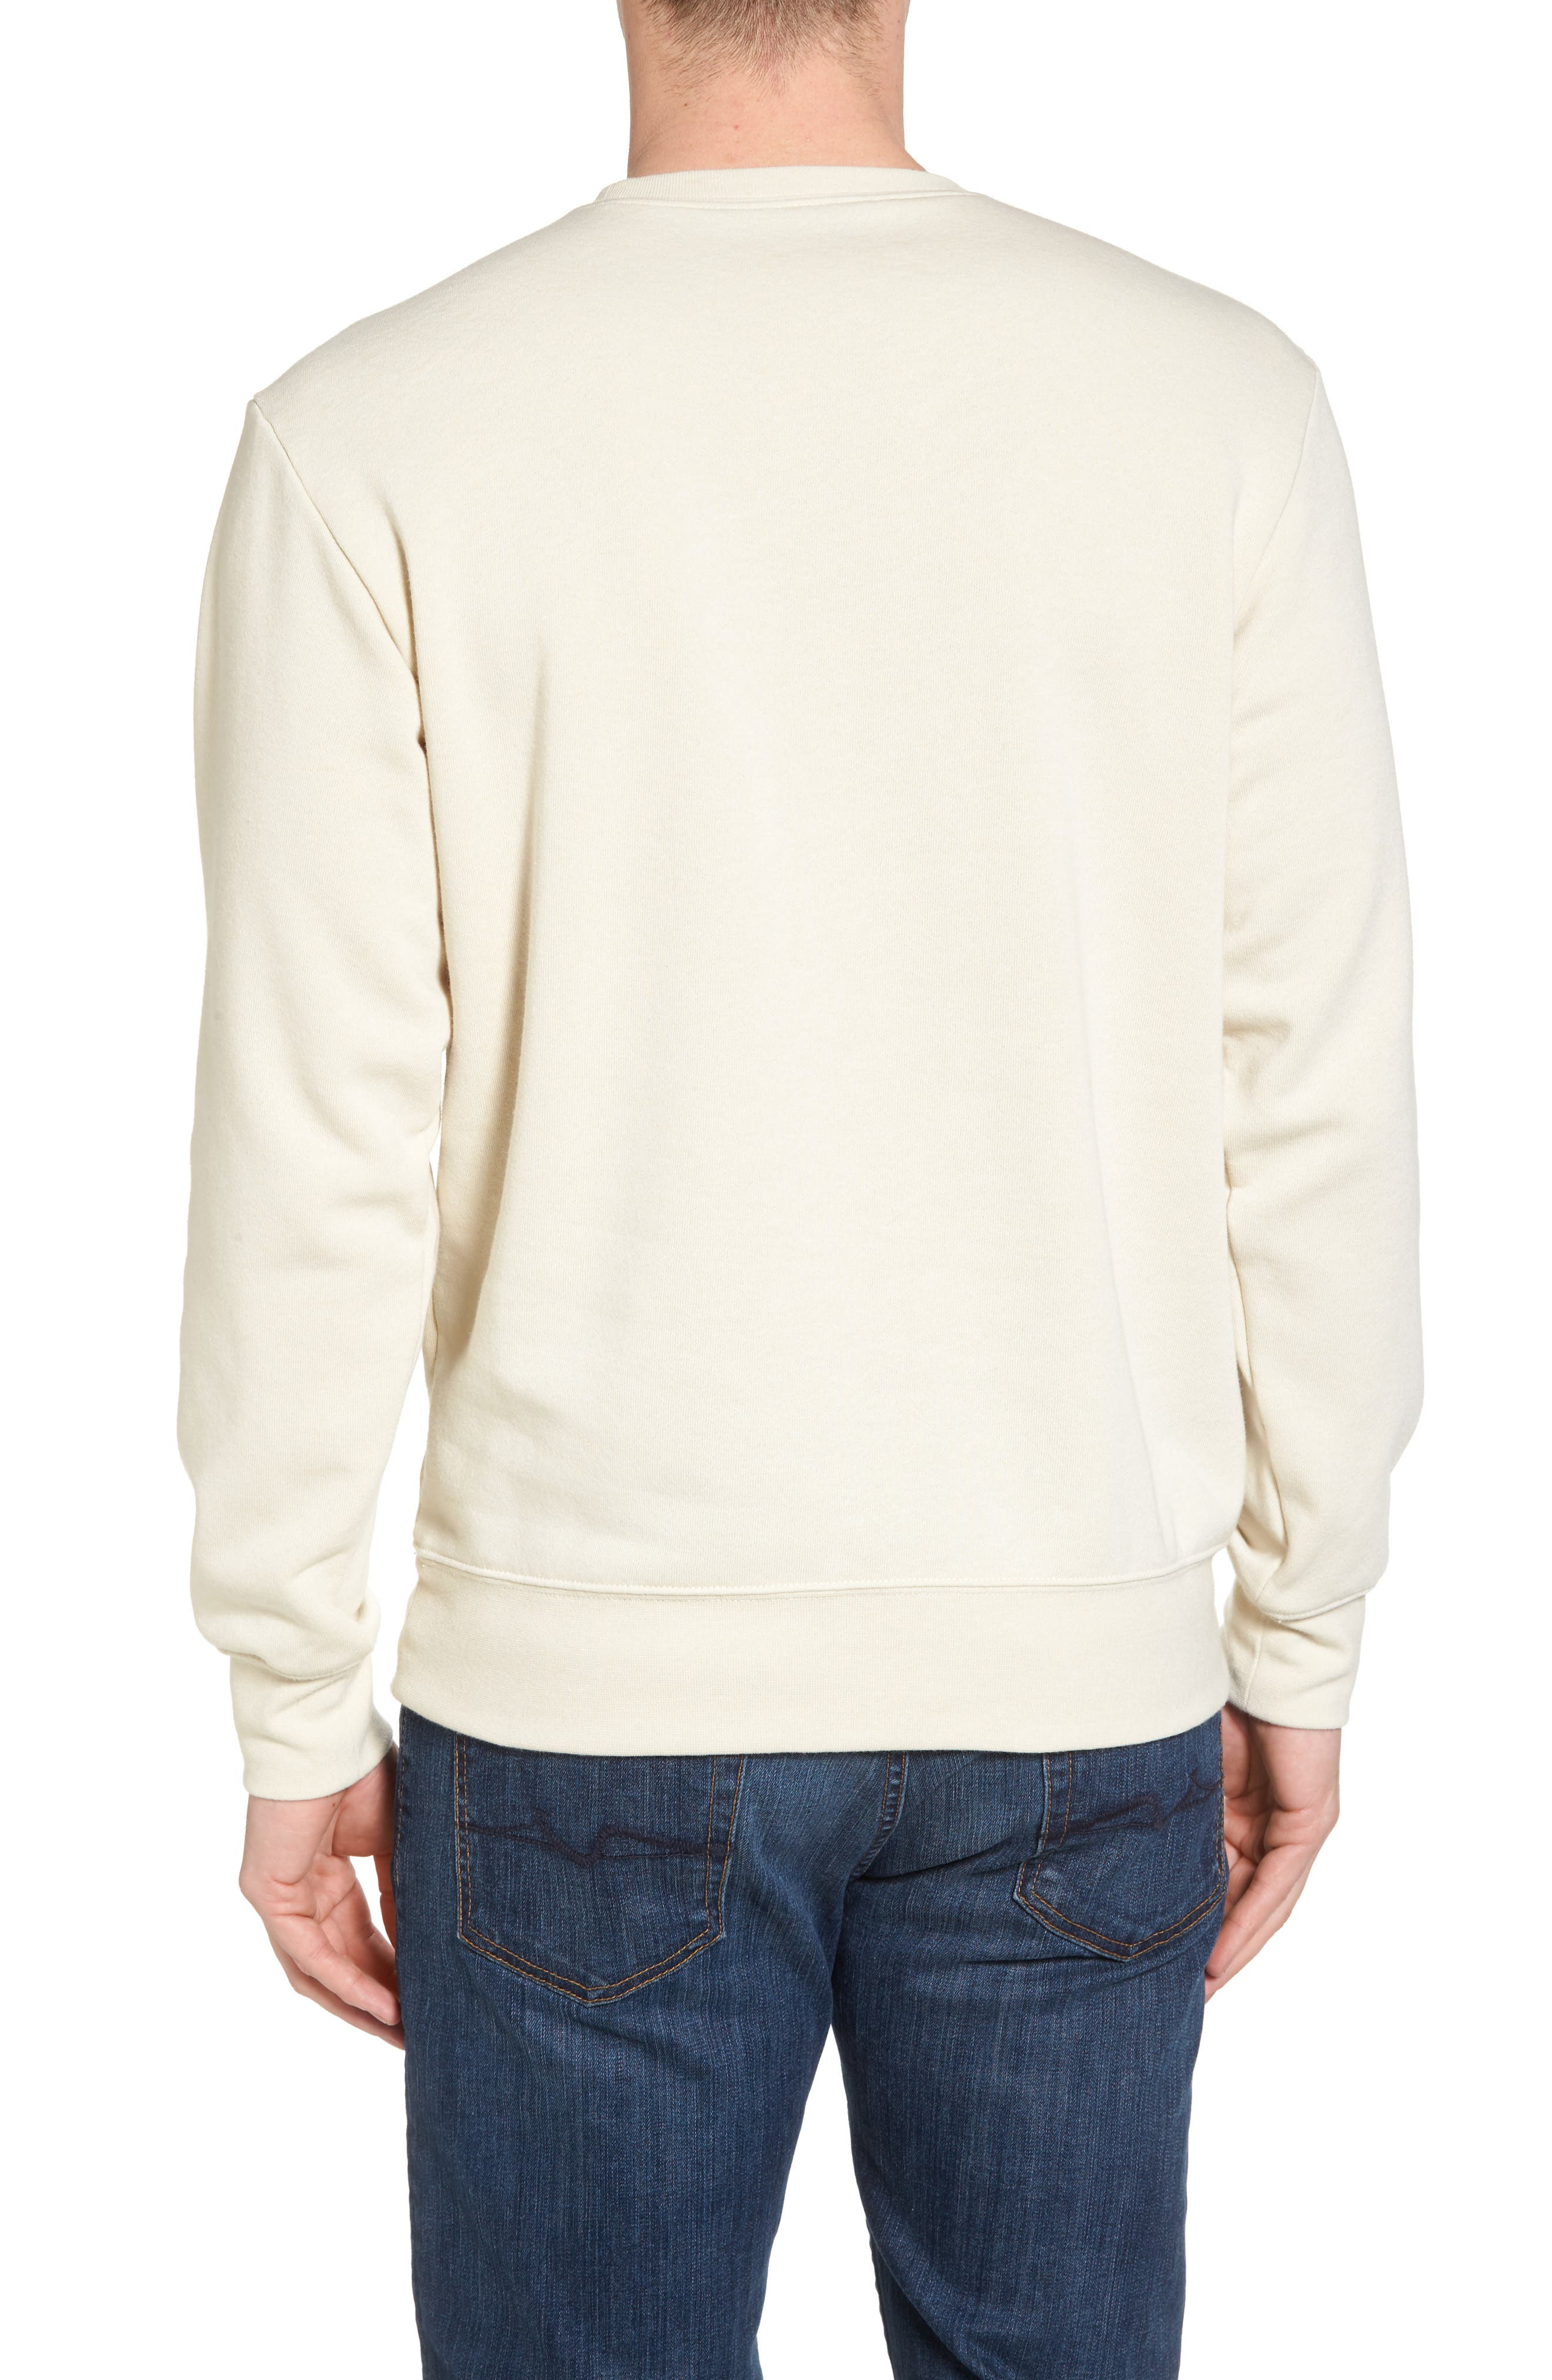 66 Classic Crew Sweatshirt,                             Alternate thumbnail 2, color,                             100